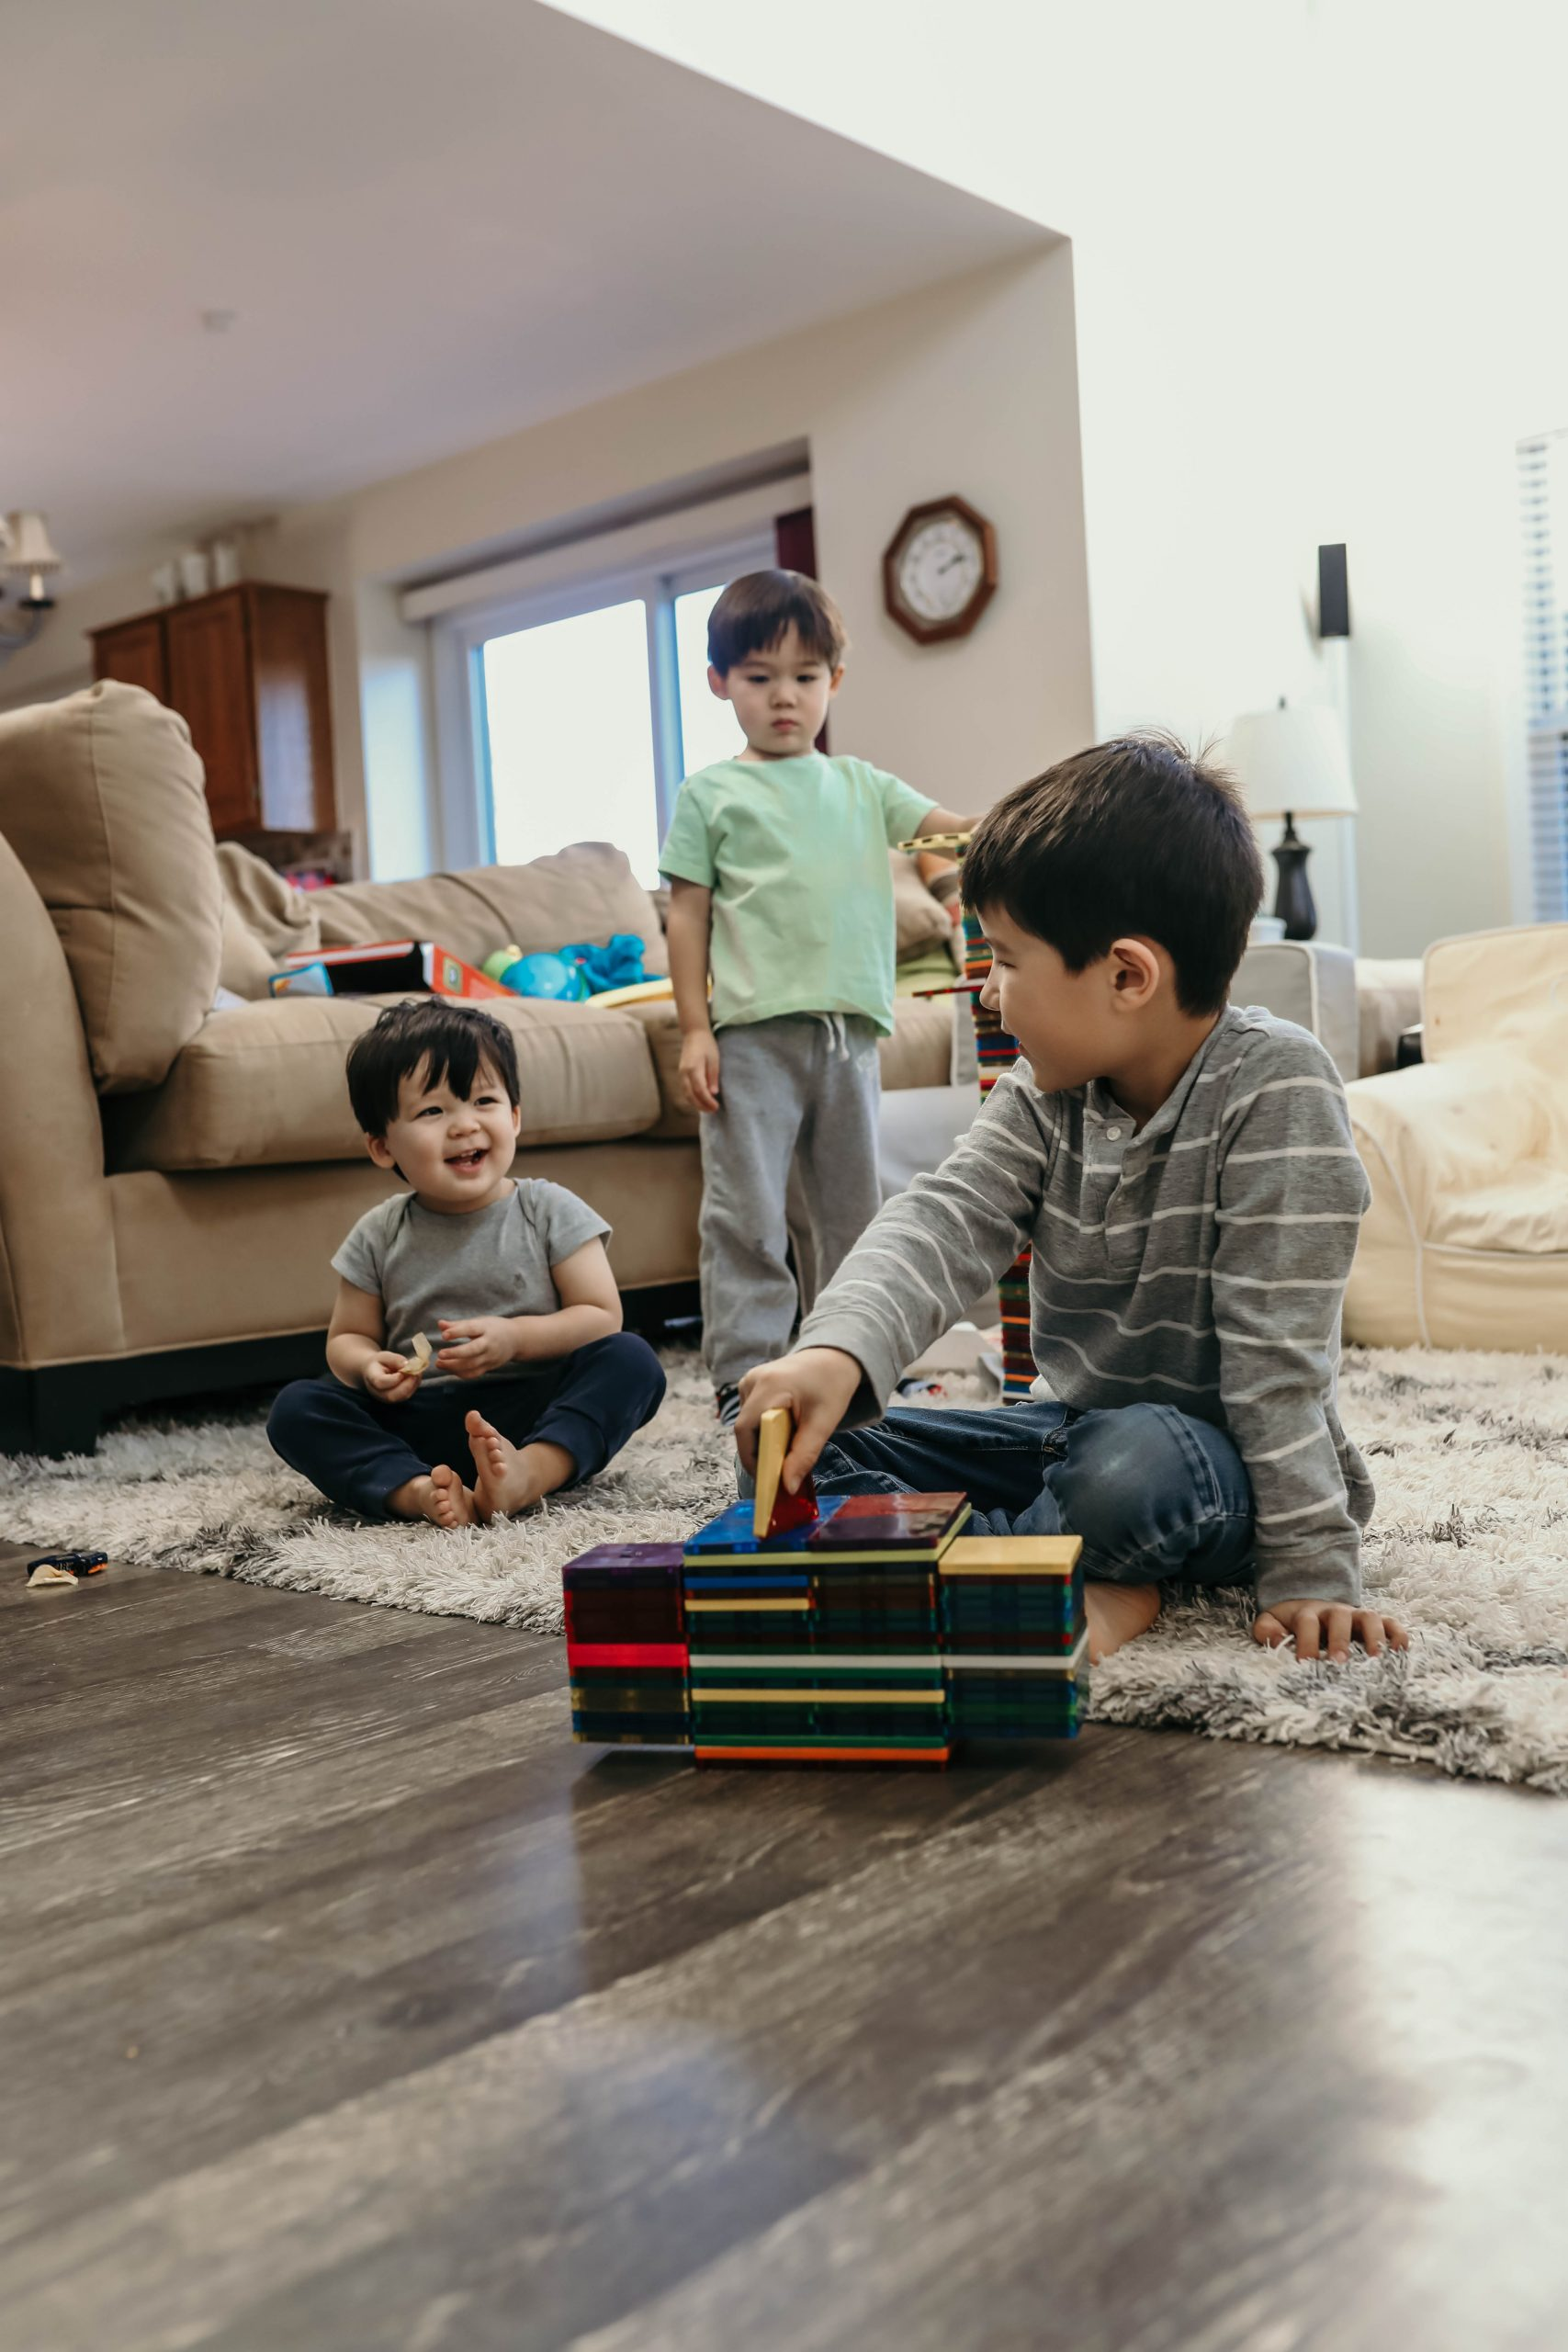 activity kits and toys from amazon